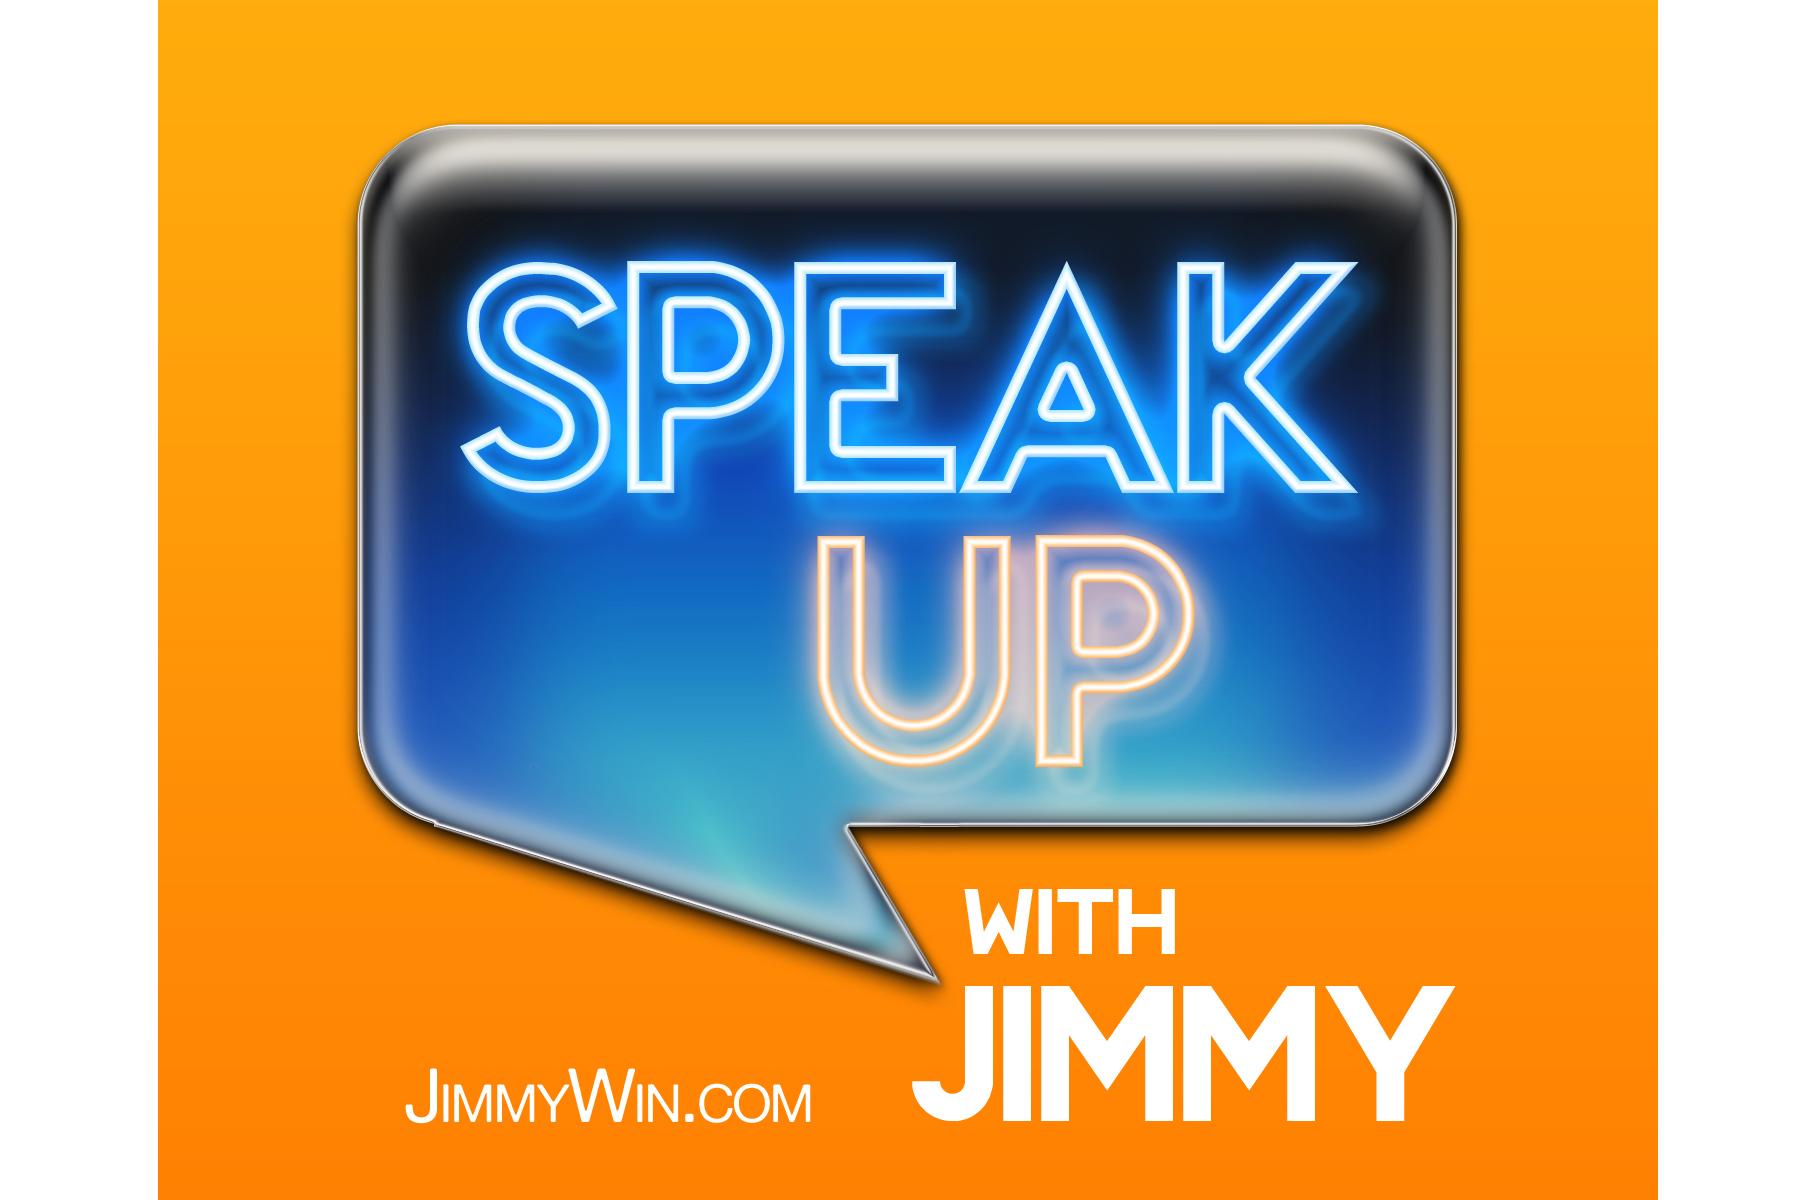 SPEAK-UP-WITH-JIMMY-LOGO